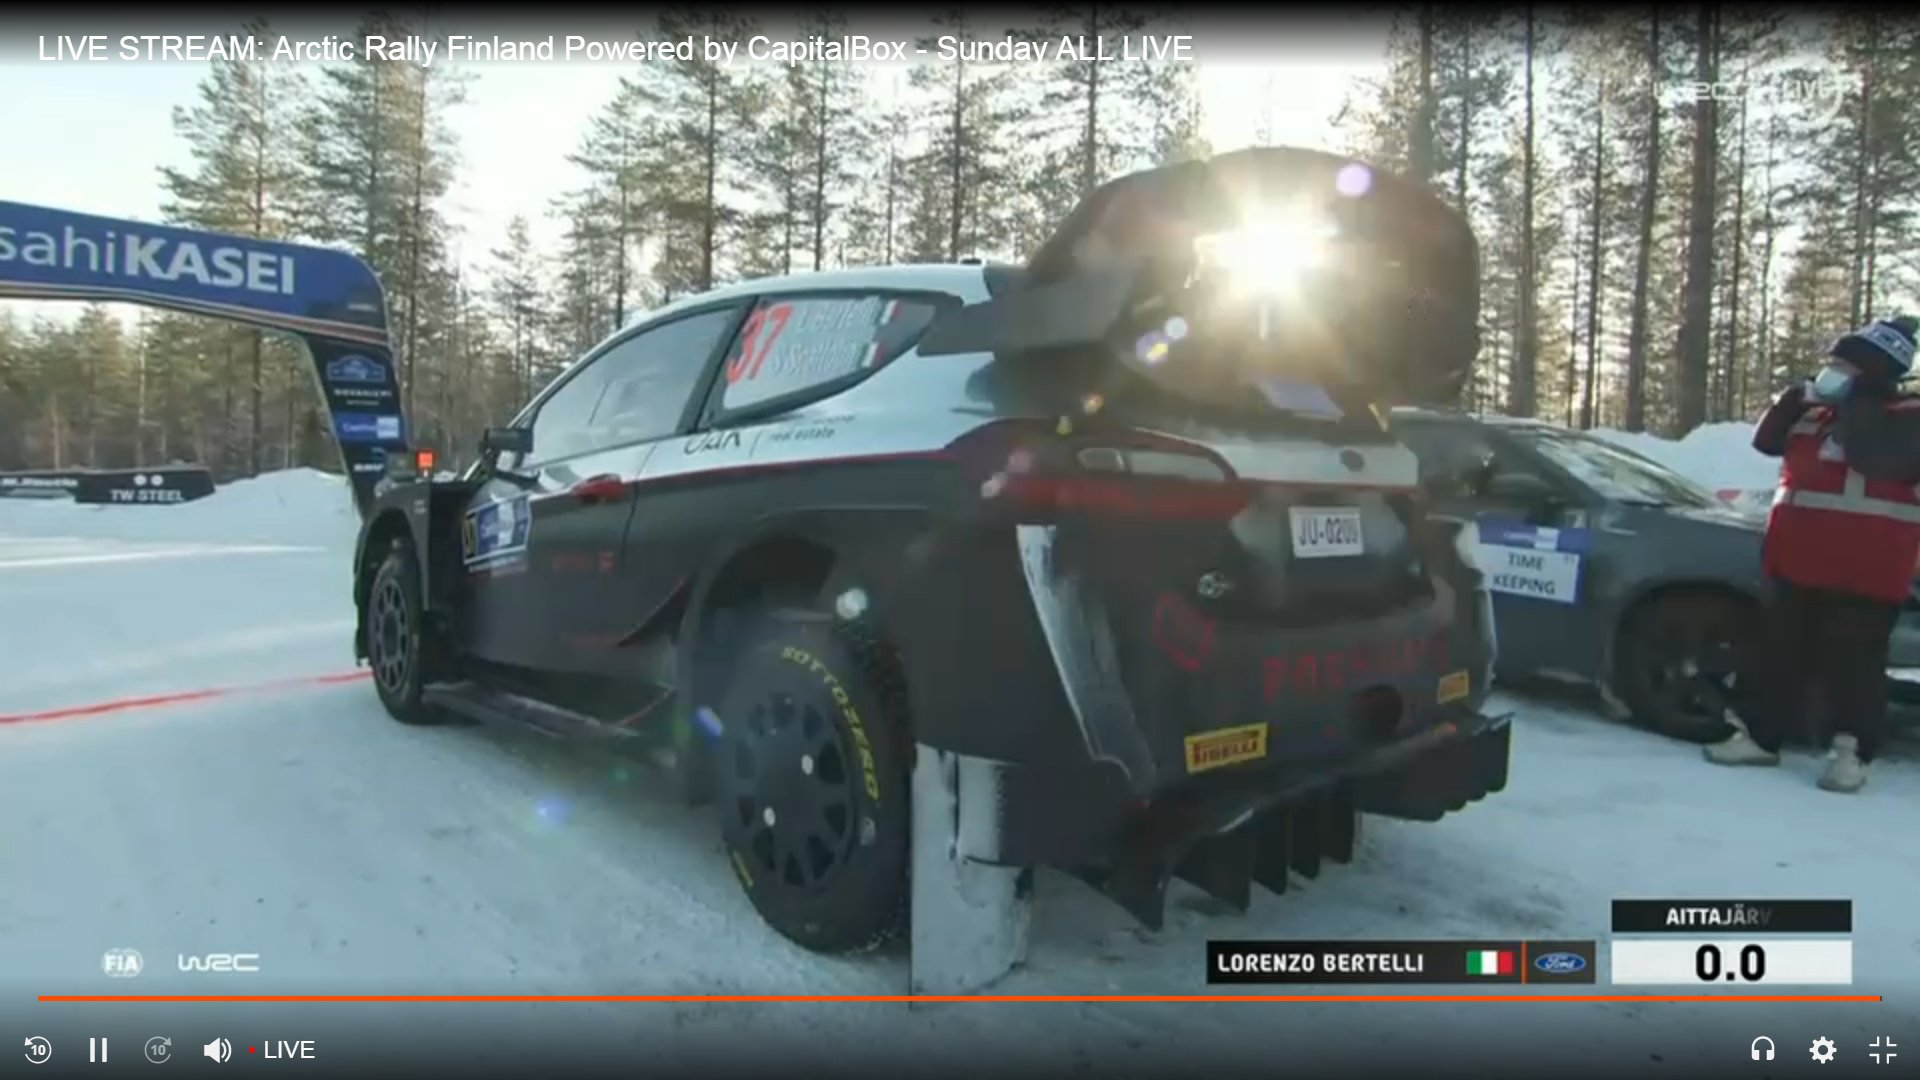 WRC: Arctic Rally Finland - Powered by CapitalBox [26-28 Febrero] - Página 7 EvTIcBGXAAAE1qF?format=jpg&name=large